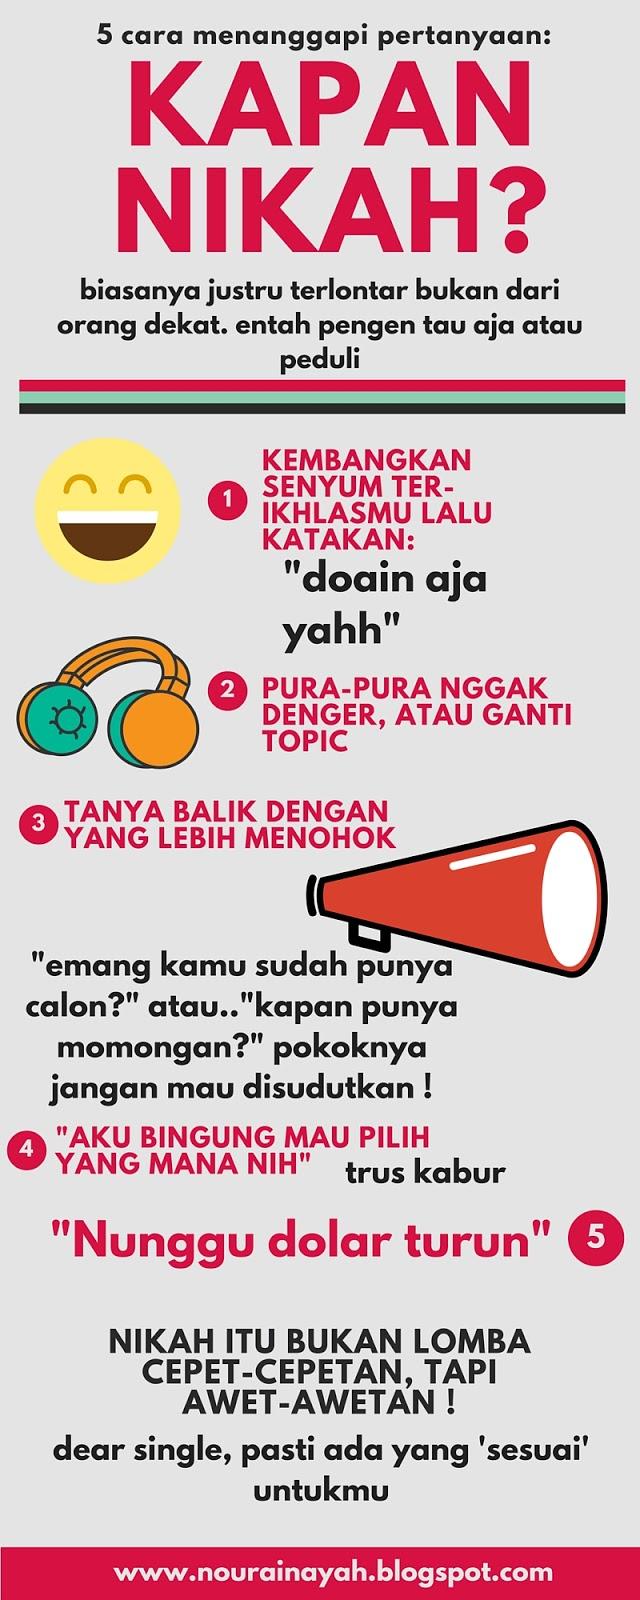 kapan nikah, infographic, single, quote, fil, review, jomblo